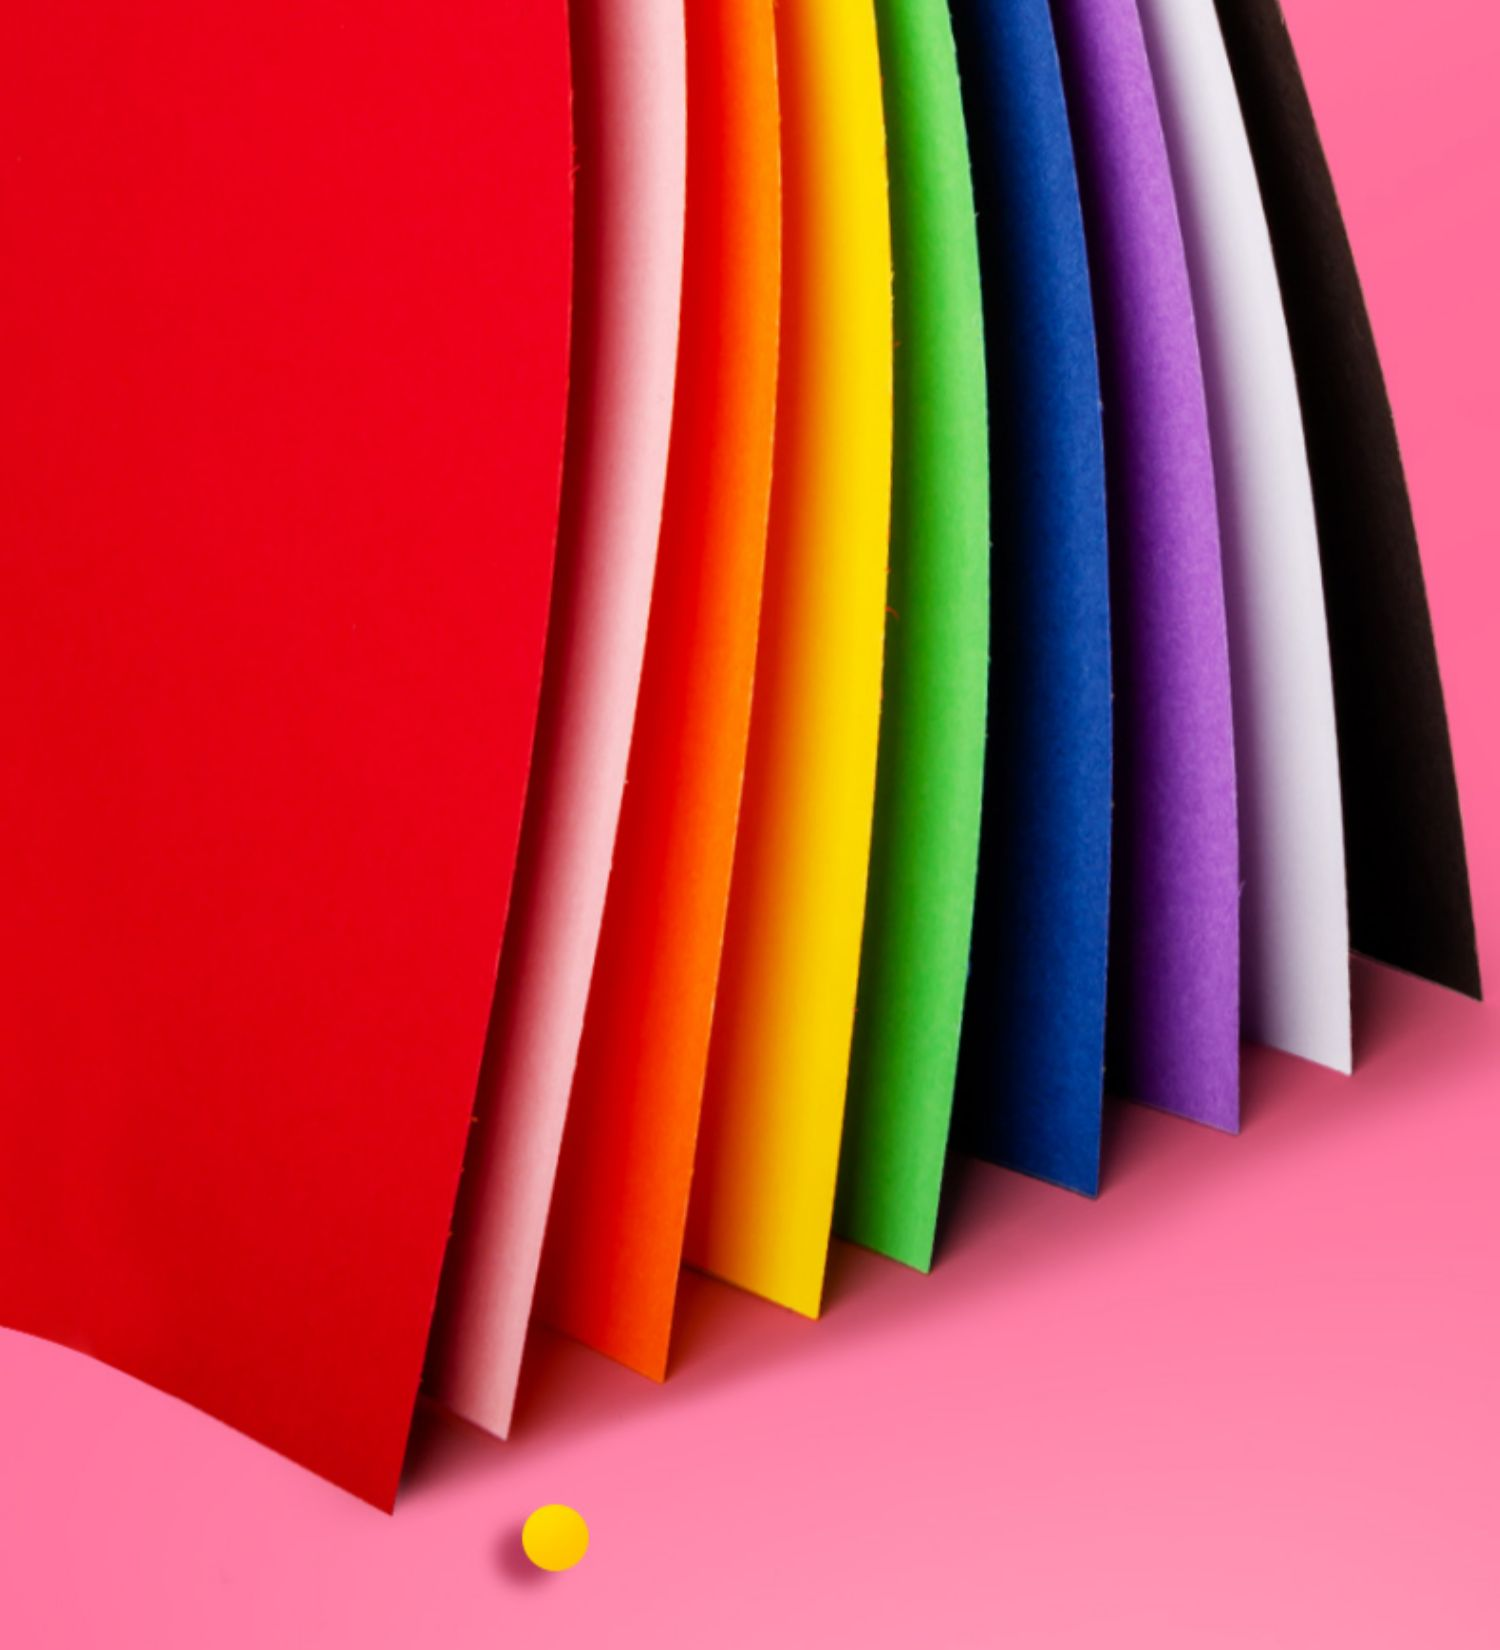 4K卡纸彩色加厚卡纸 手工折纸幼儿园彩纸儿童彩色卡纸正方形千纸鹤diy手工制作纸剪纸多功能24张套装批发商品详情图